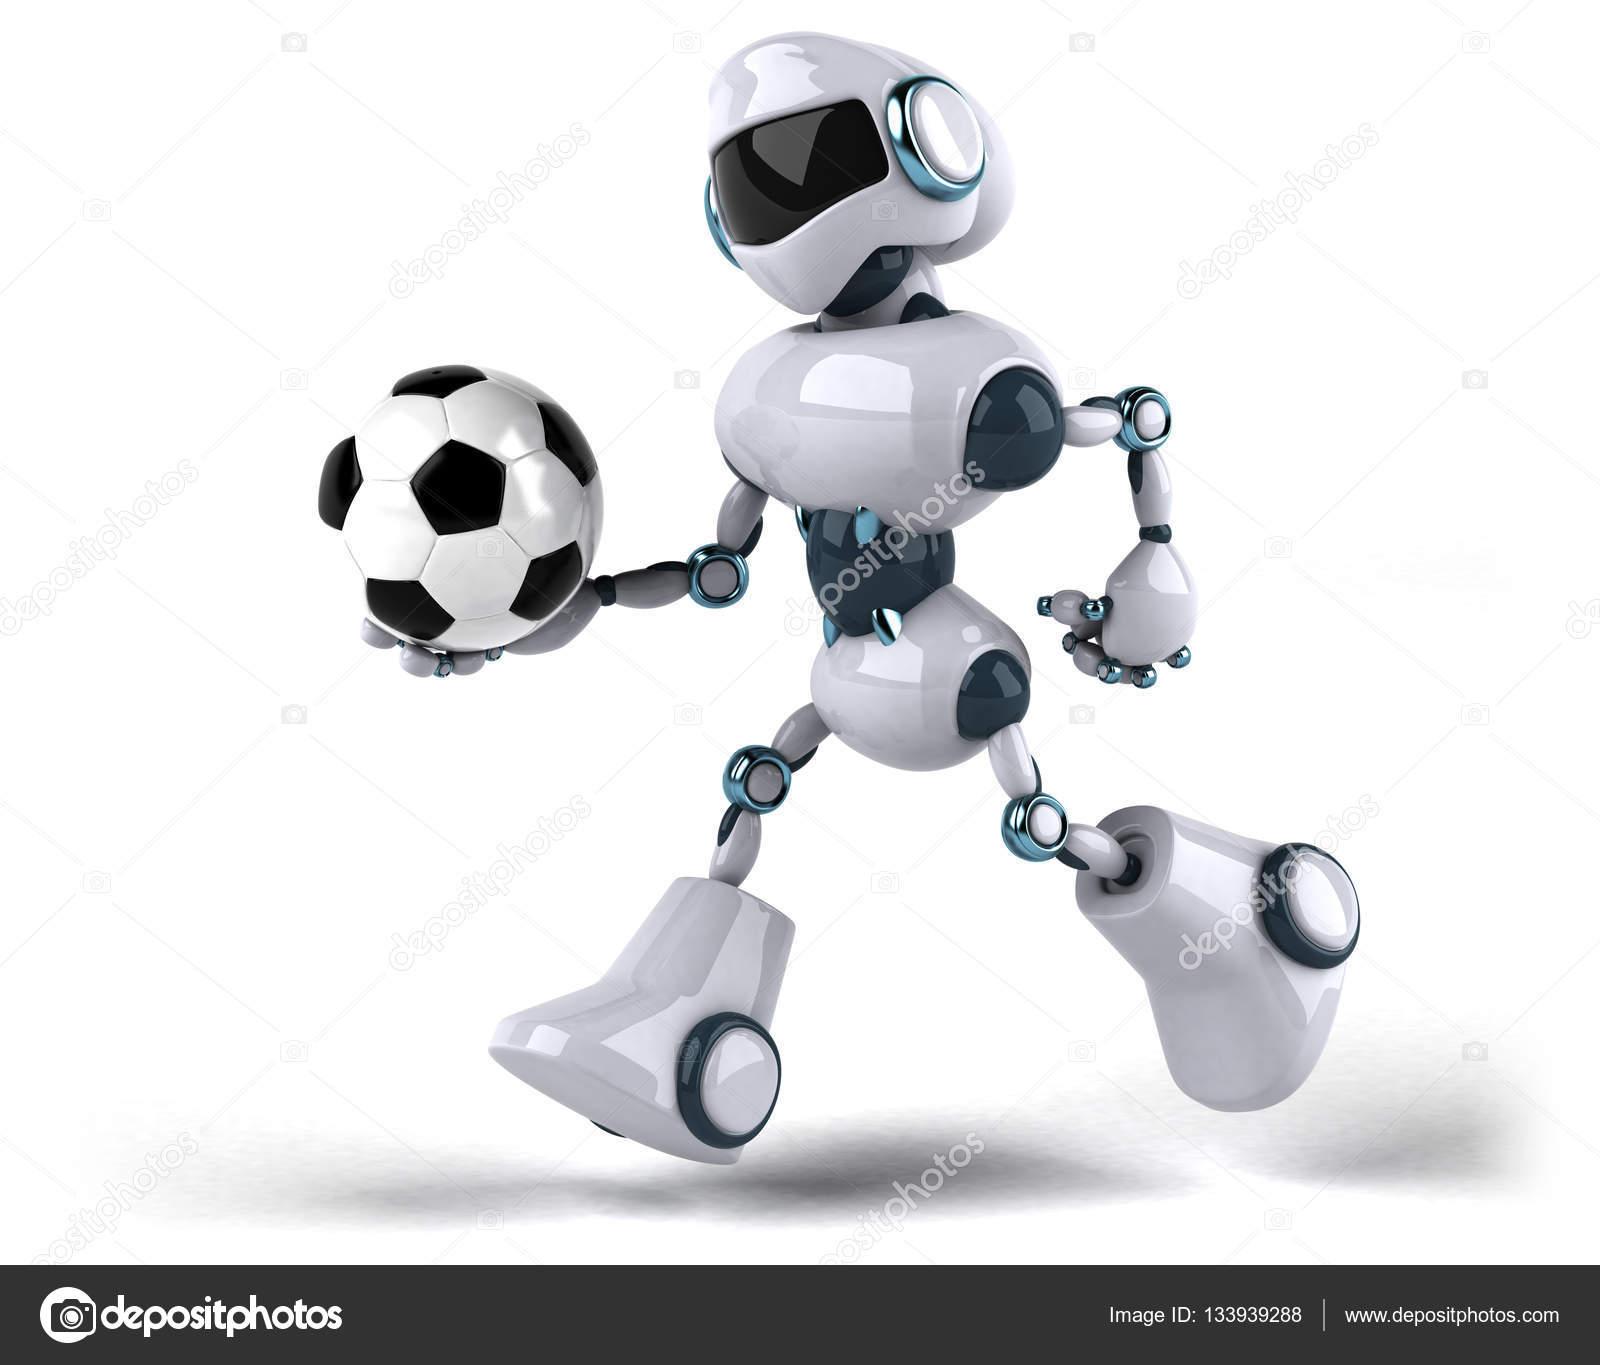 robot holding ball  u2014 stock photo  u00a9 julos  133939288